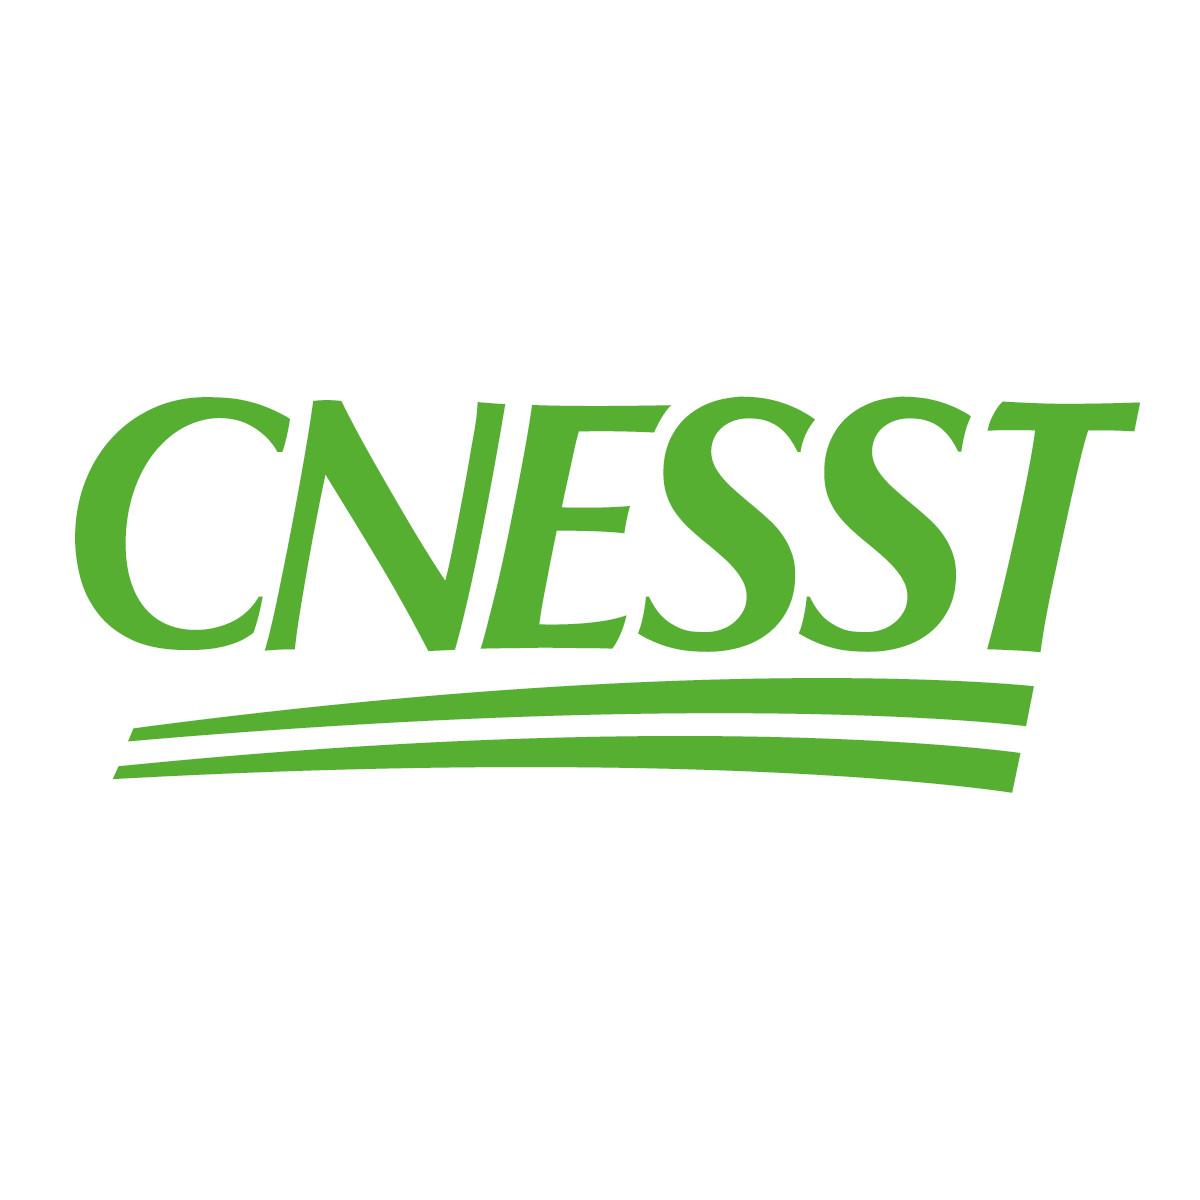 cnesst